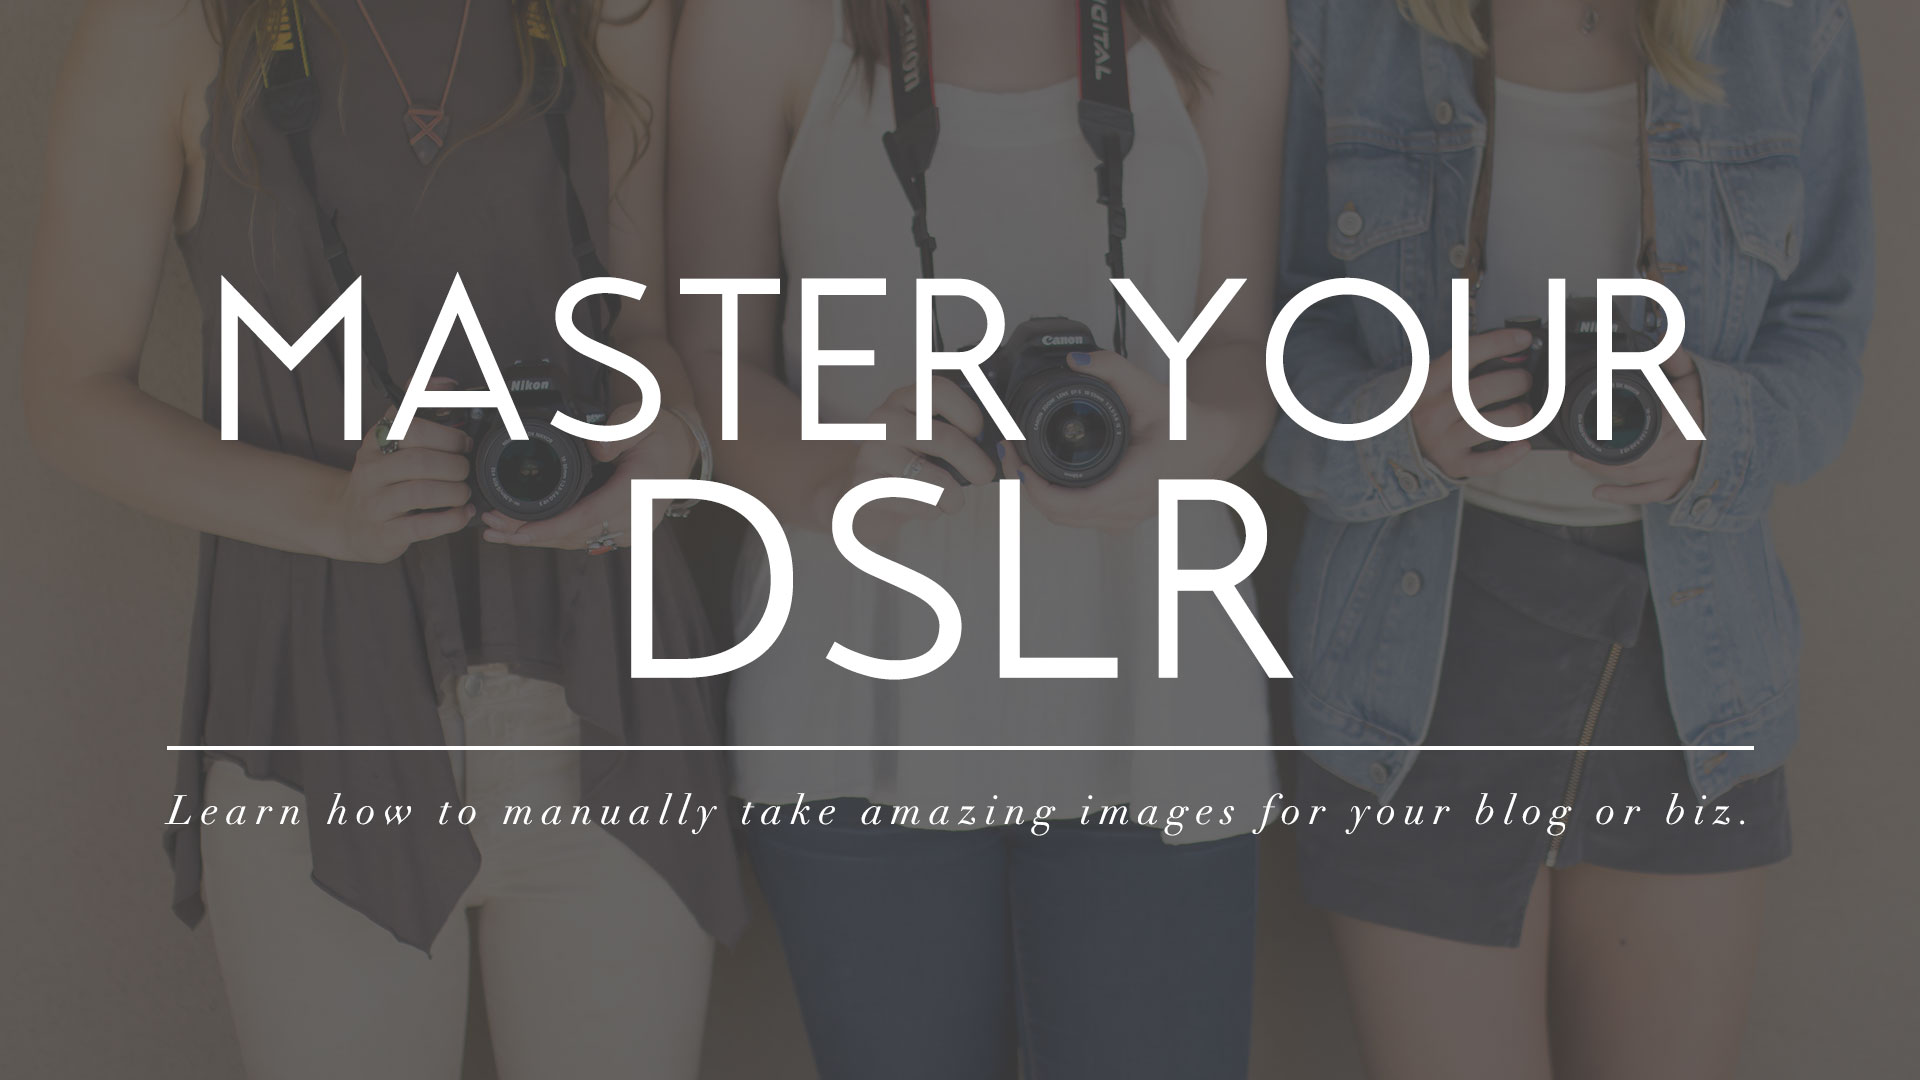 Master Your DSLR